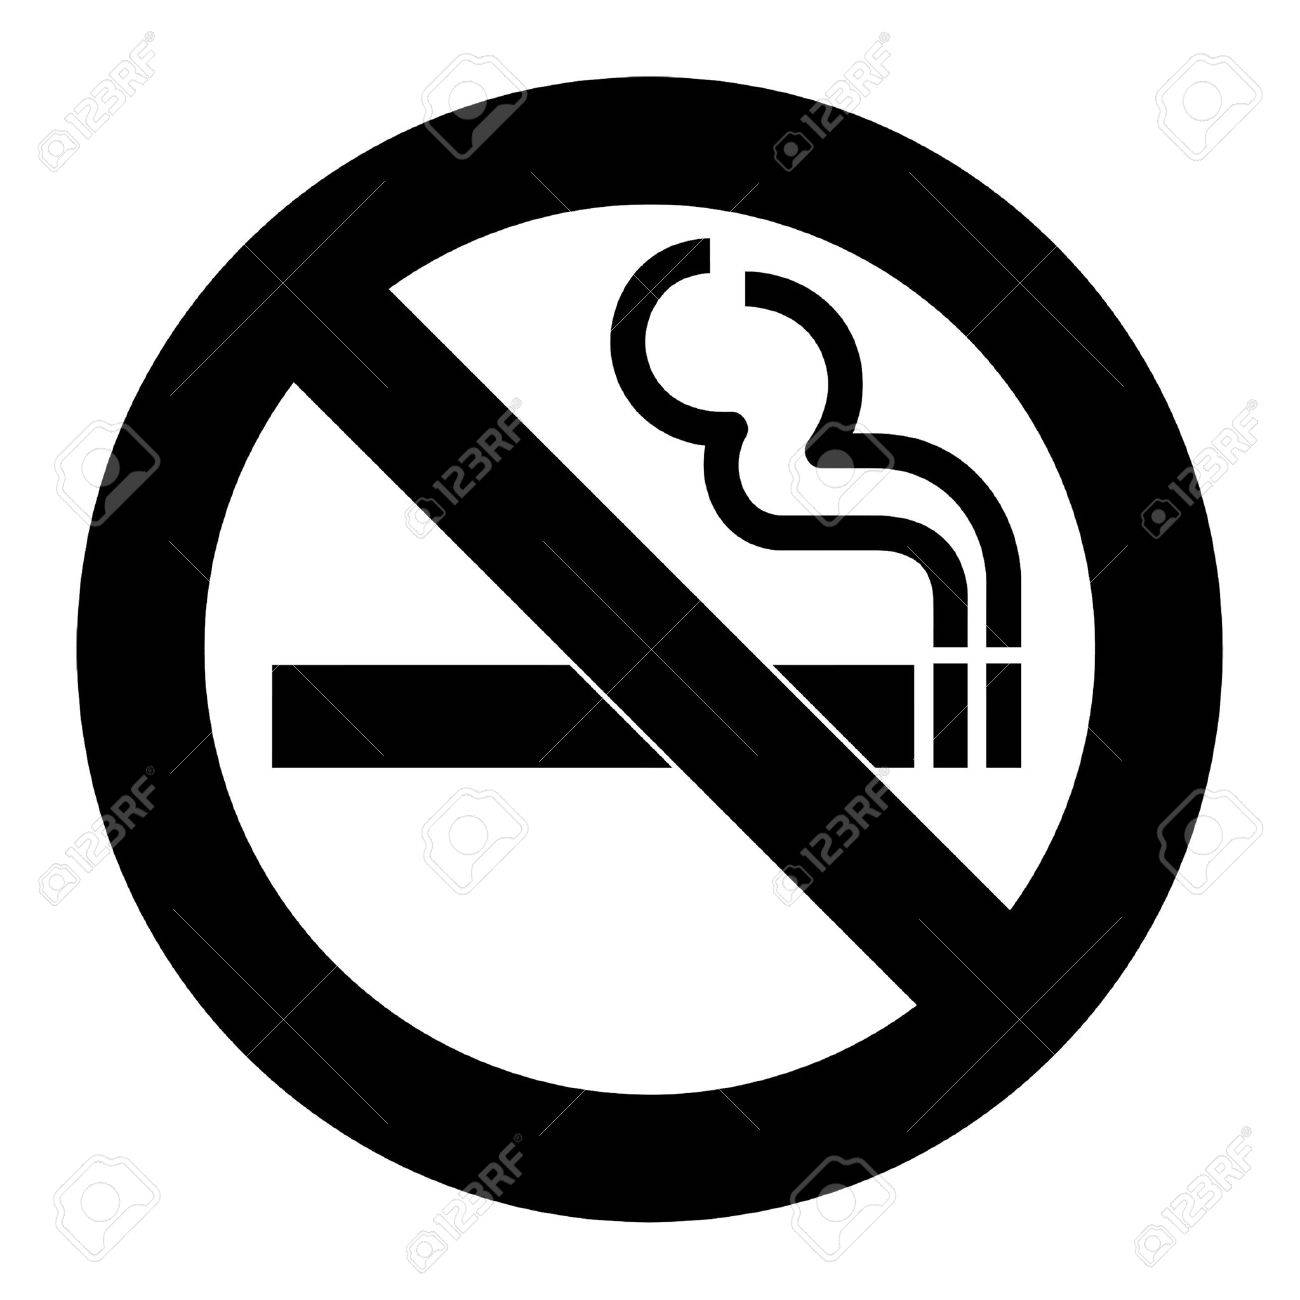 No smoking sign or symbol; isolated on white background. - 9219798